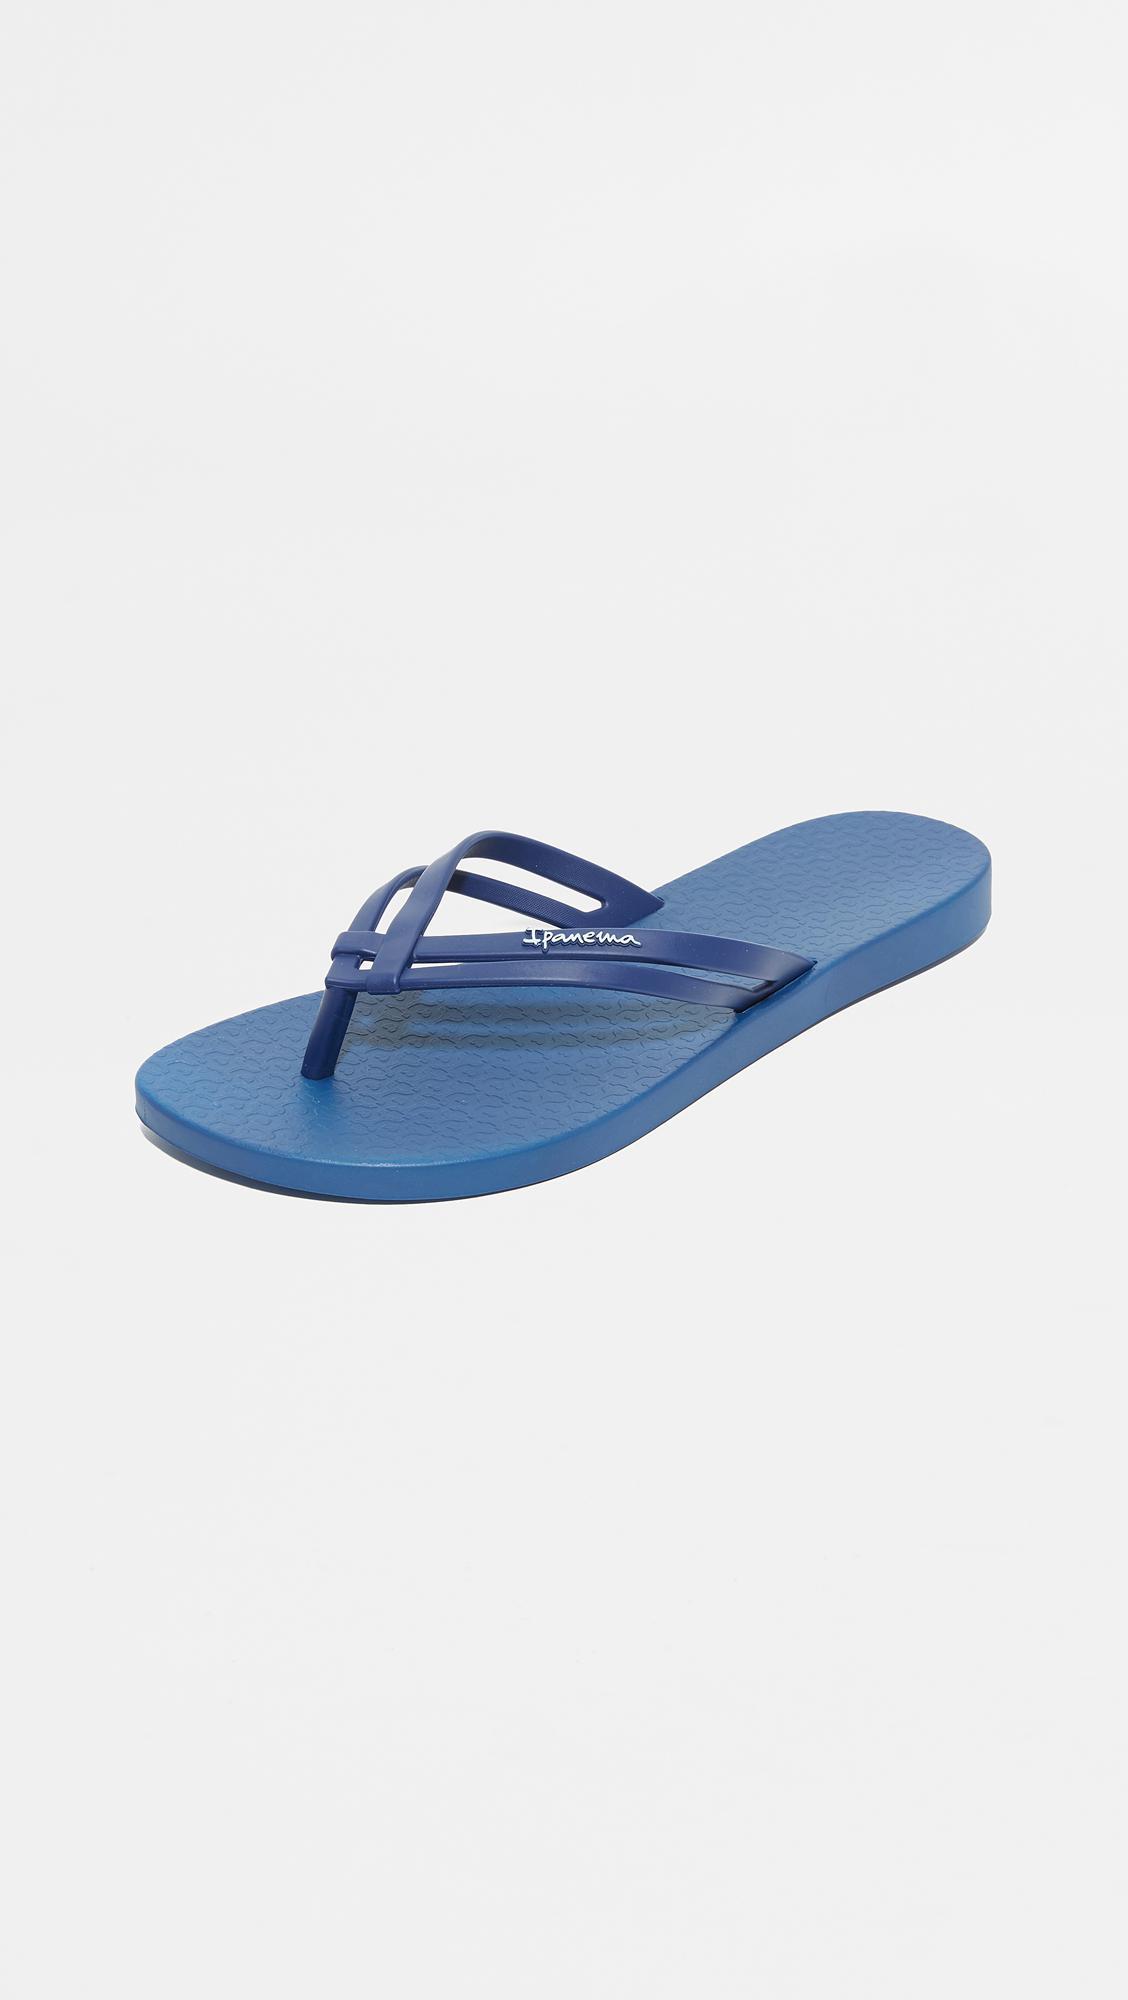 f613a5456589e Ipanema Hashtag Flip Flops in Blue - Save 7% - Lyst